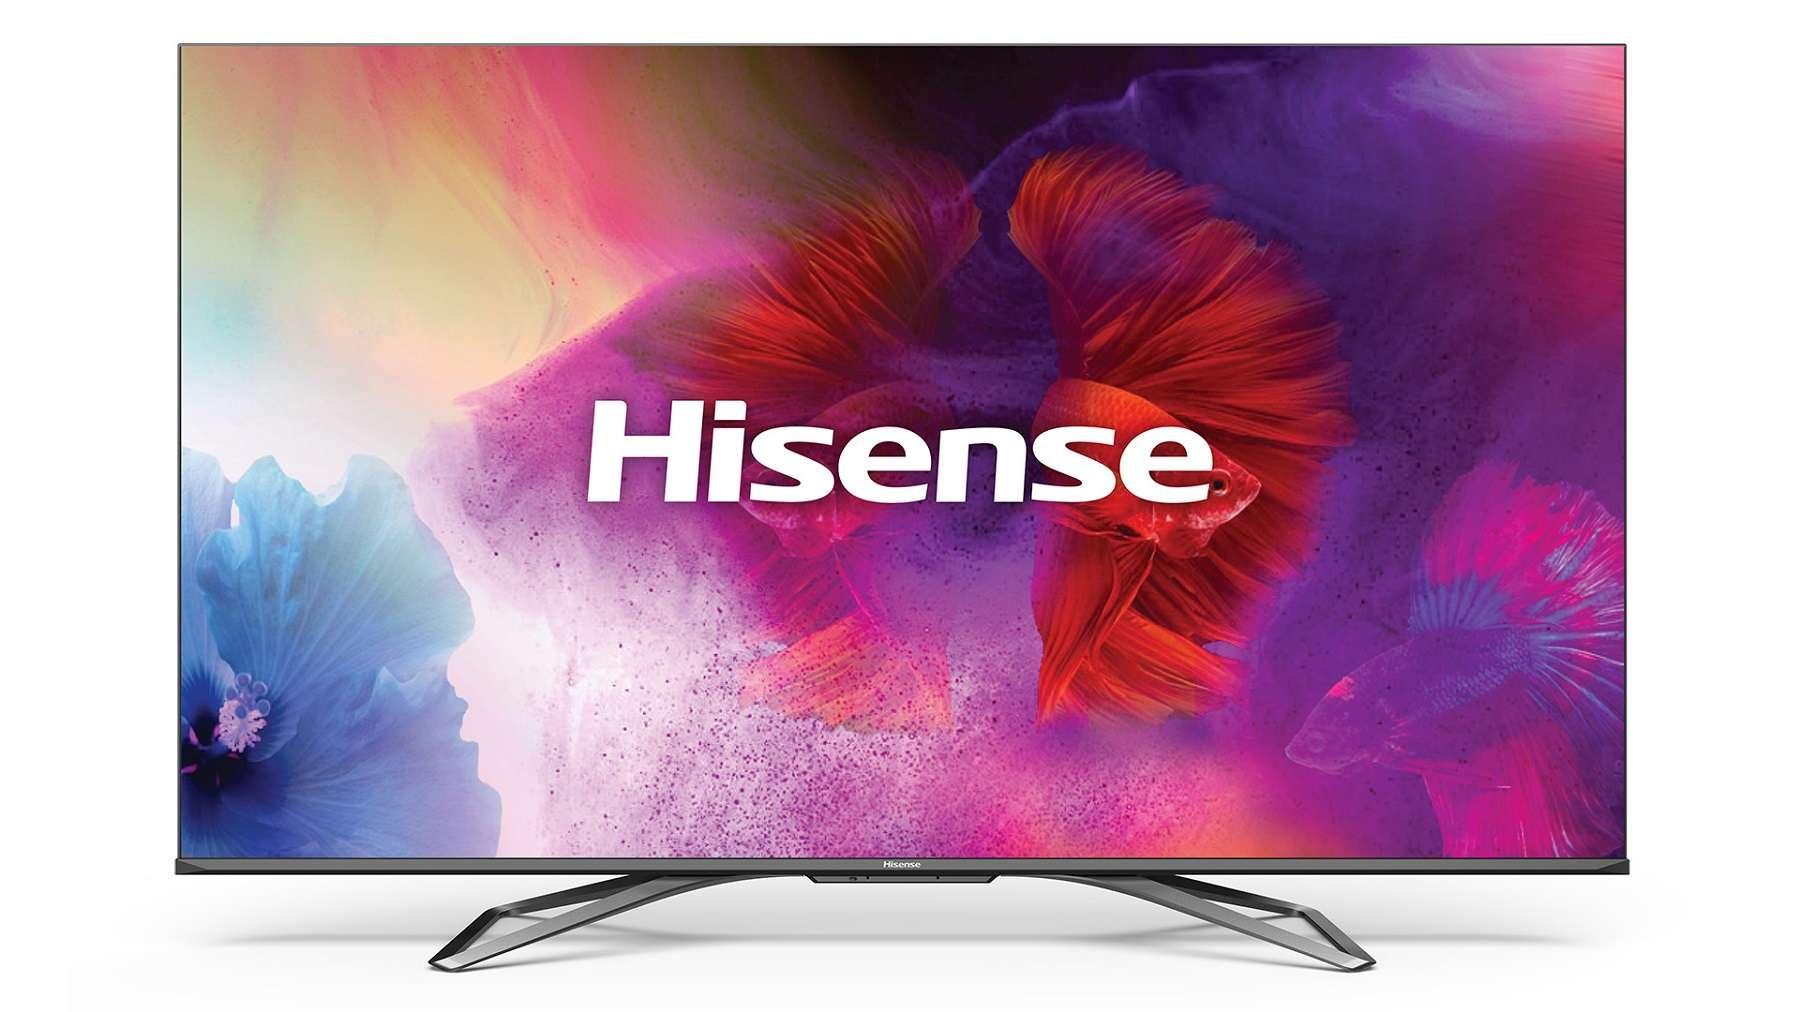 Hisense End of Year Sale